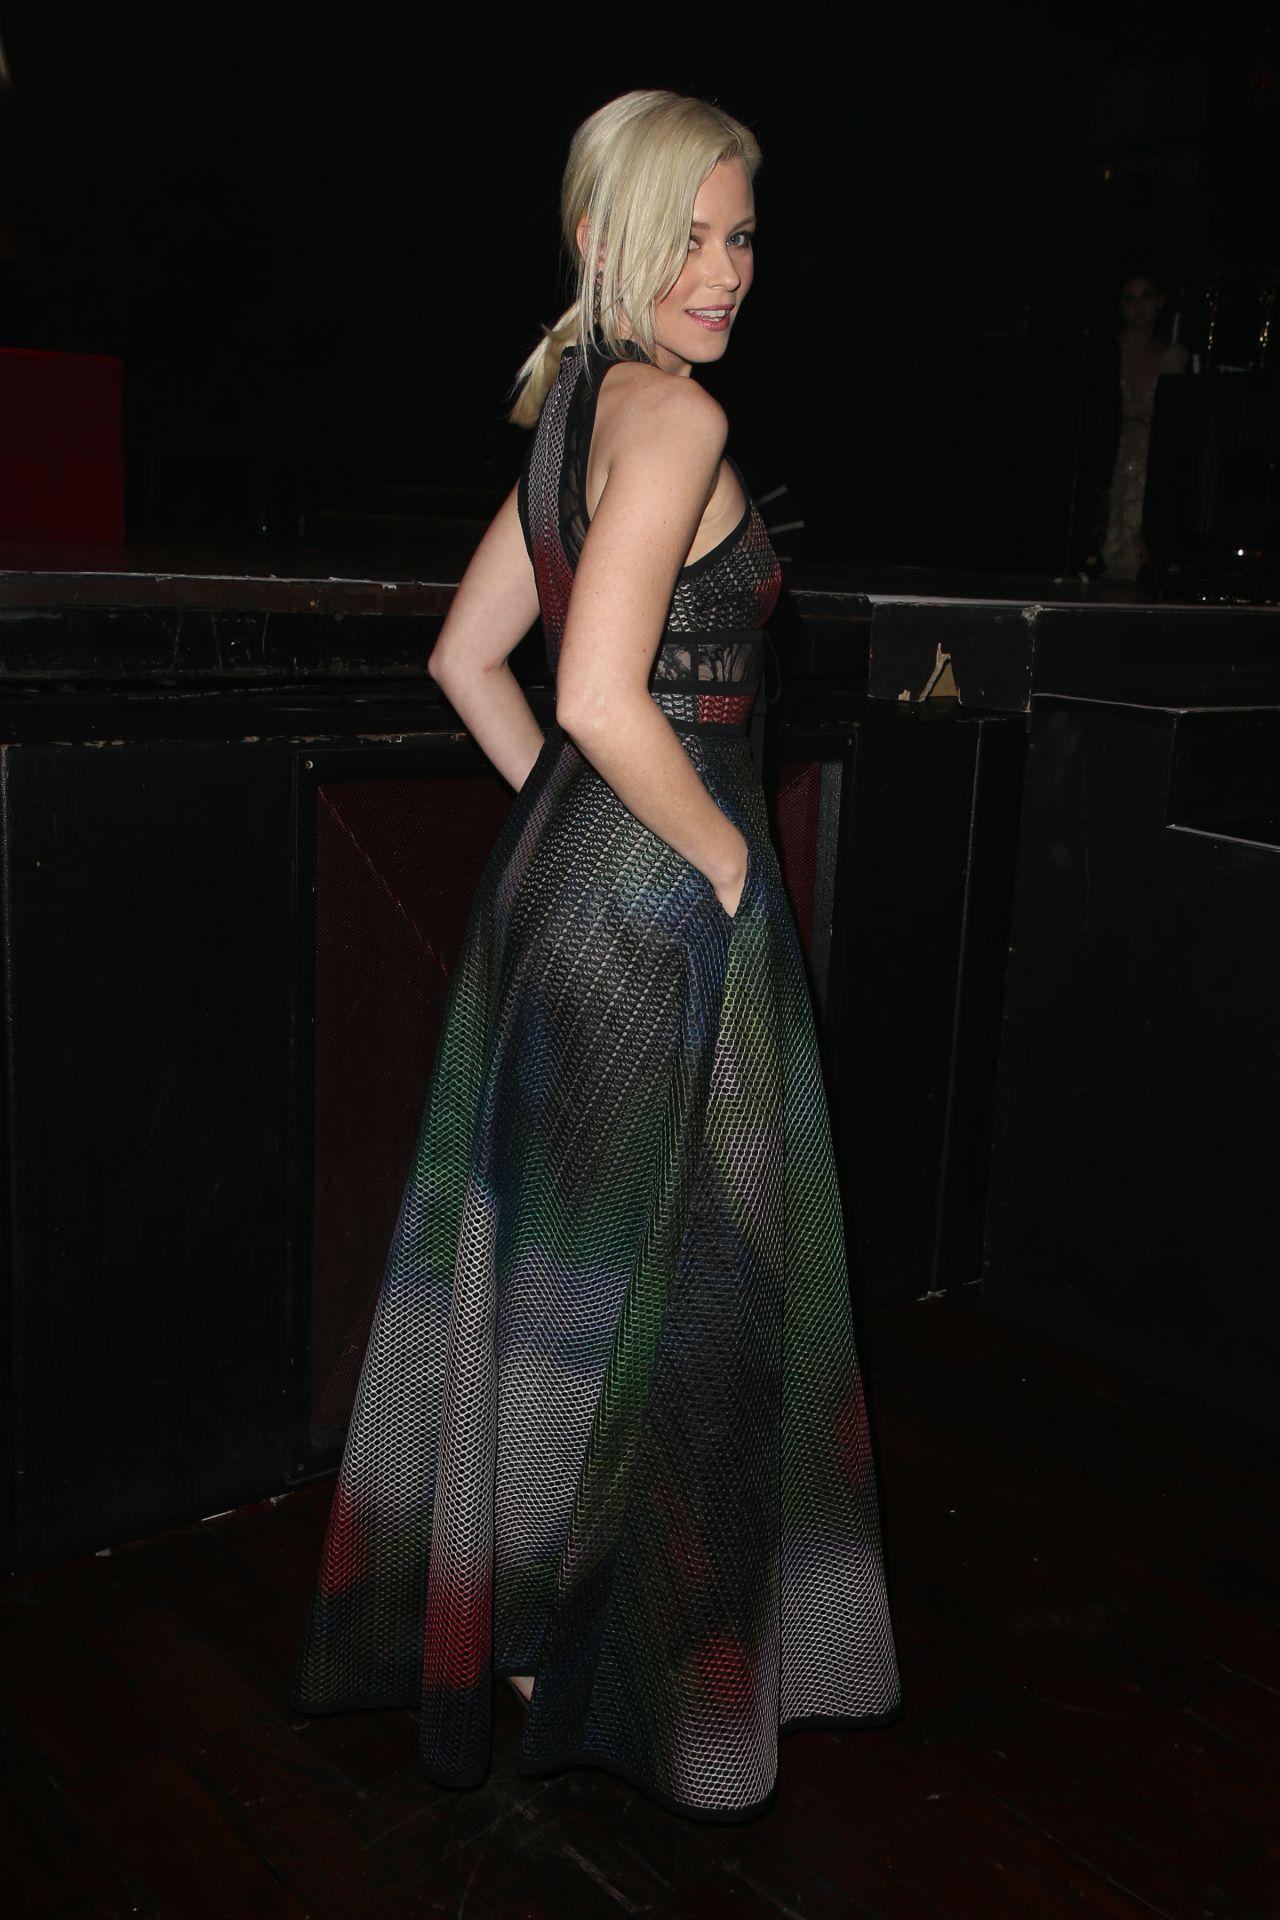 http://celebmafia.com/wp-content/uploads/2018/02/elizabeth-banks-2018-hollywood-beauty-awards-in-la-3.jpg